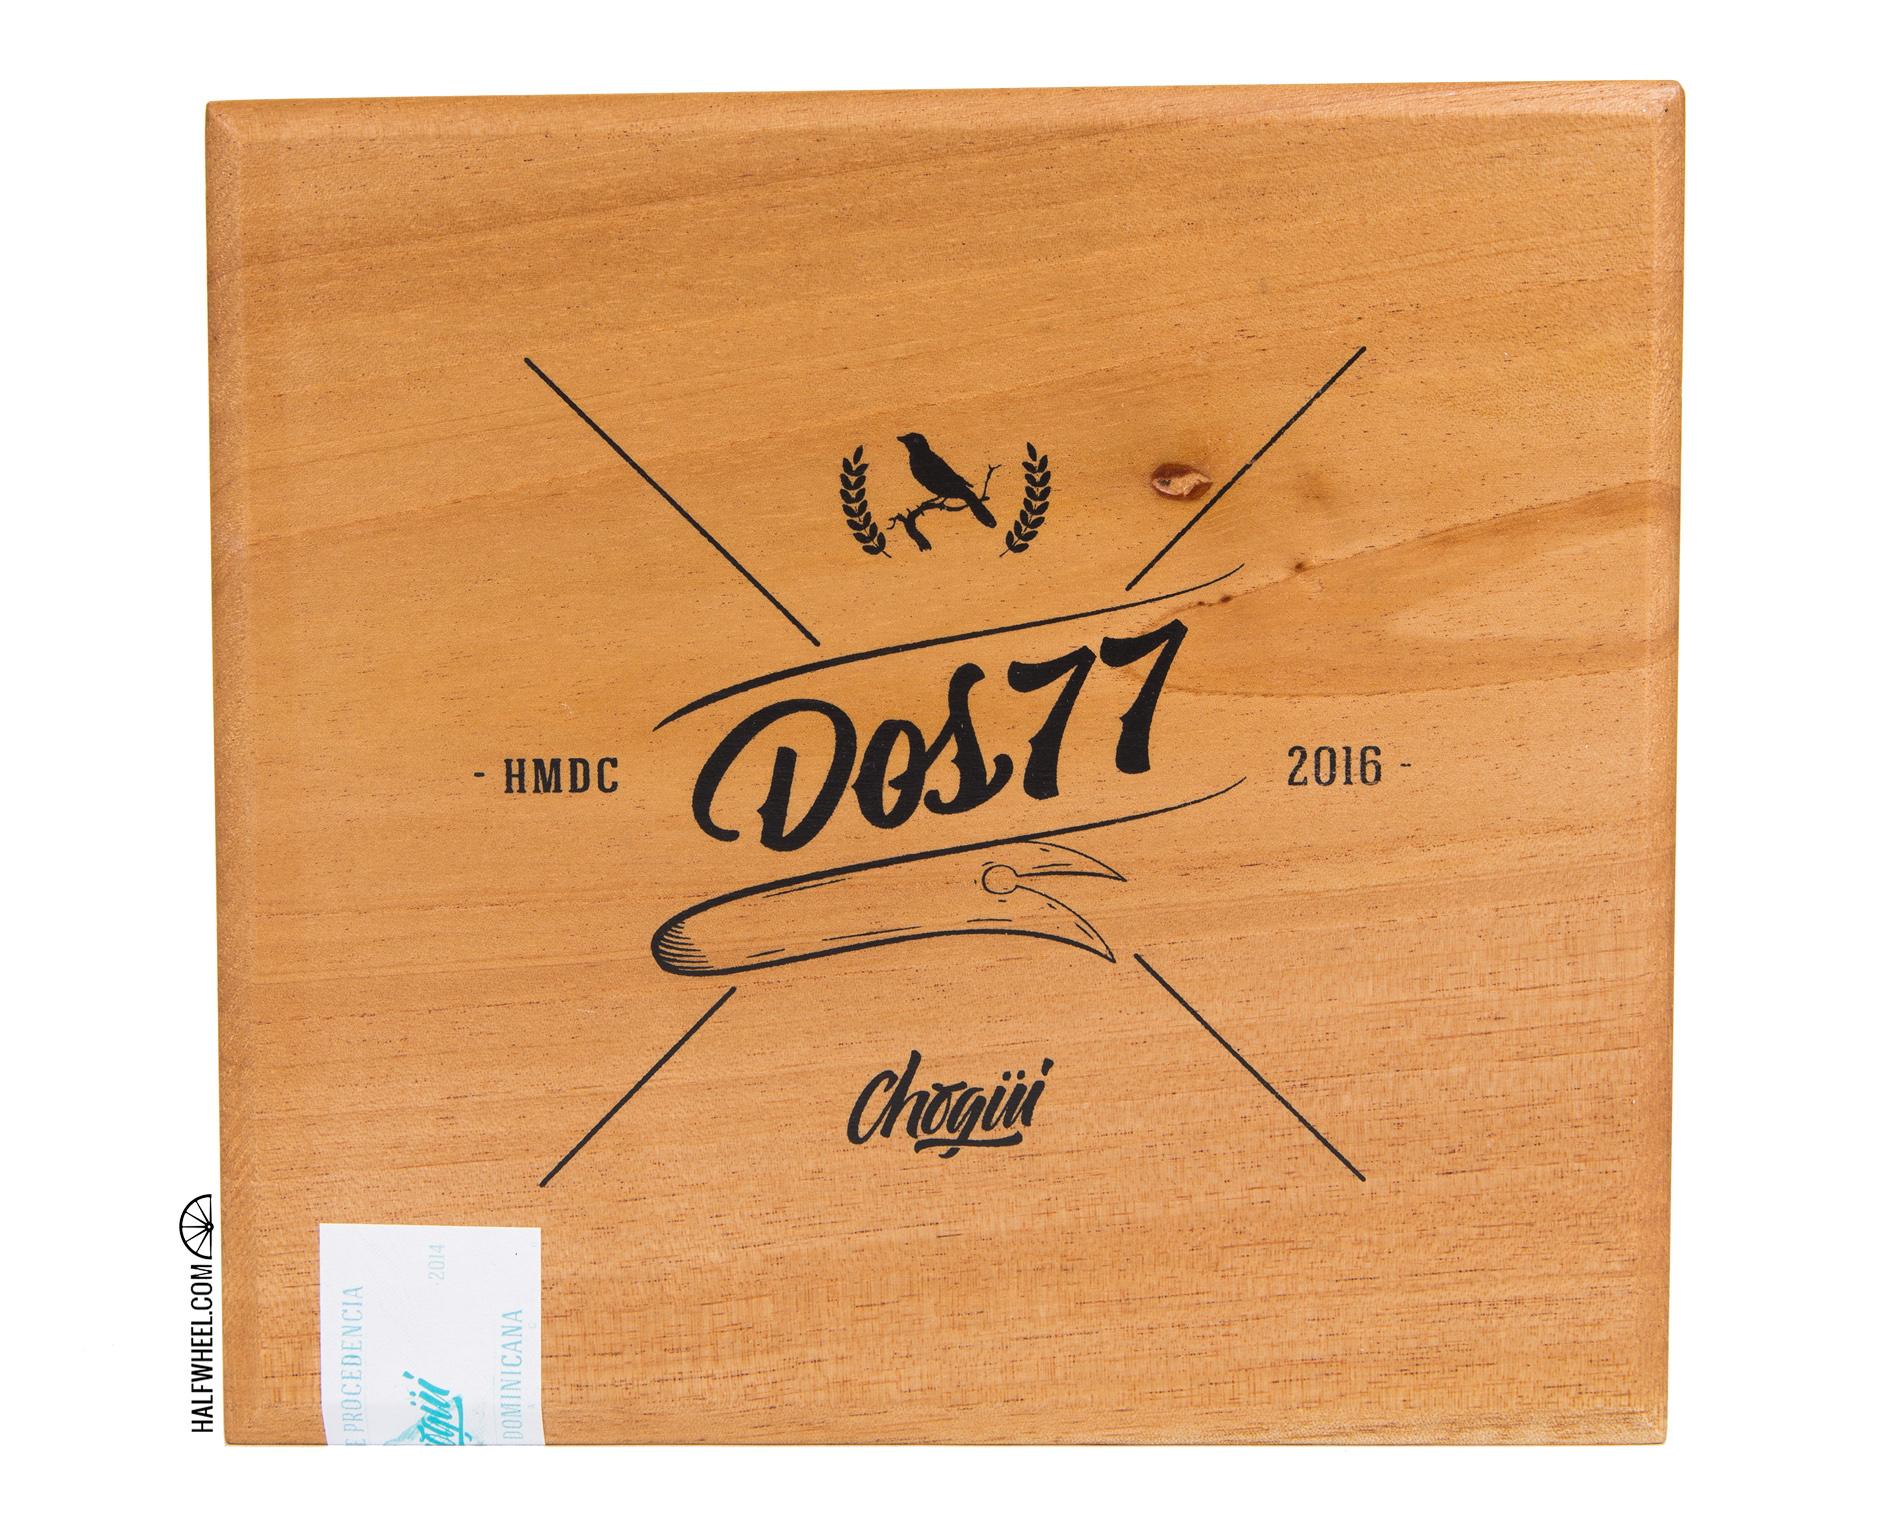 Chogui Dos77 Longsdale Box 1